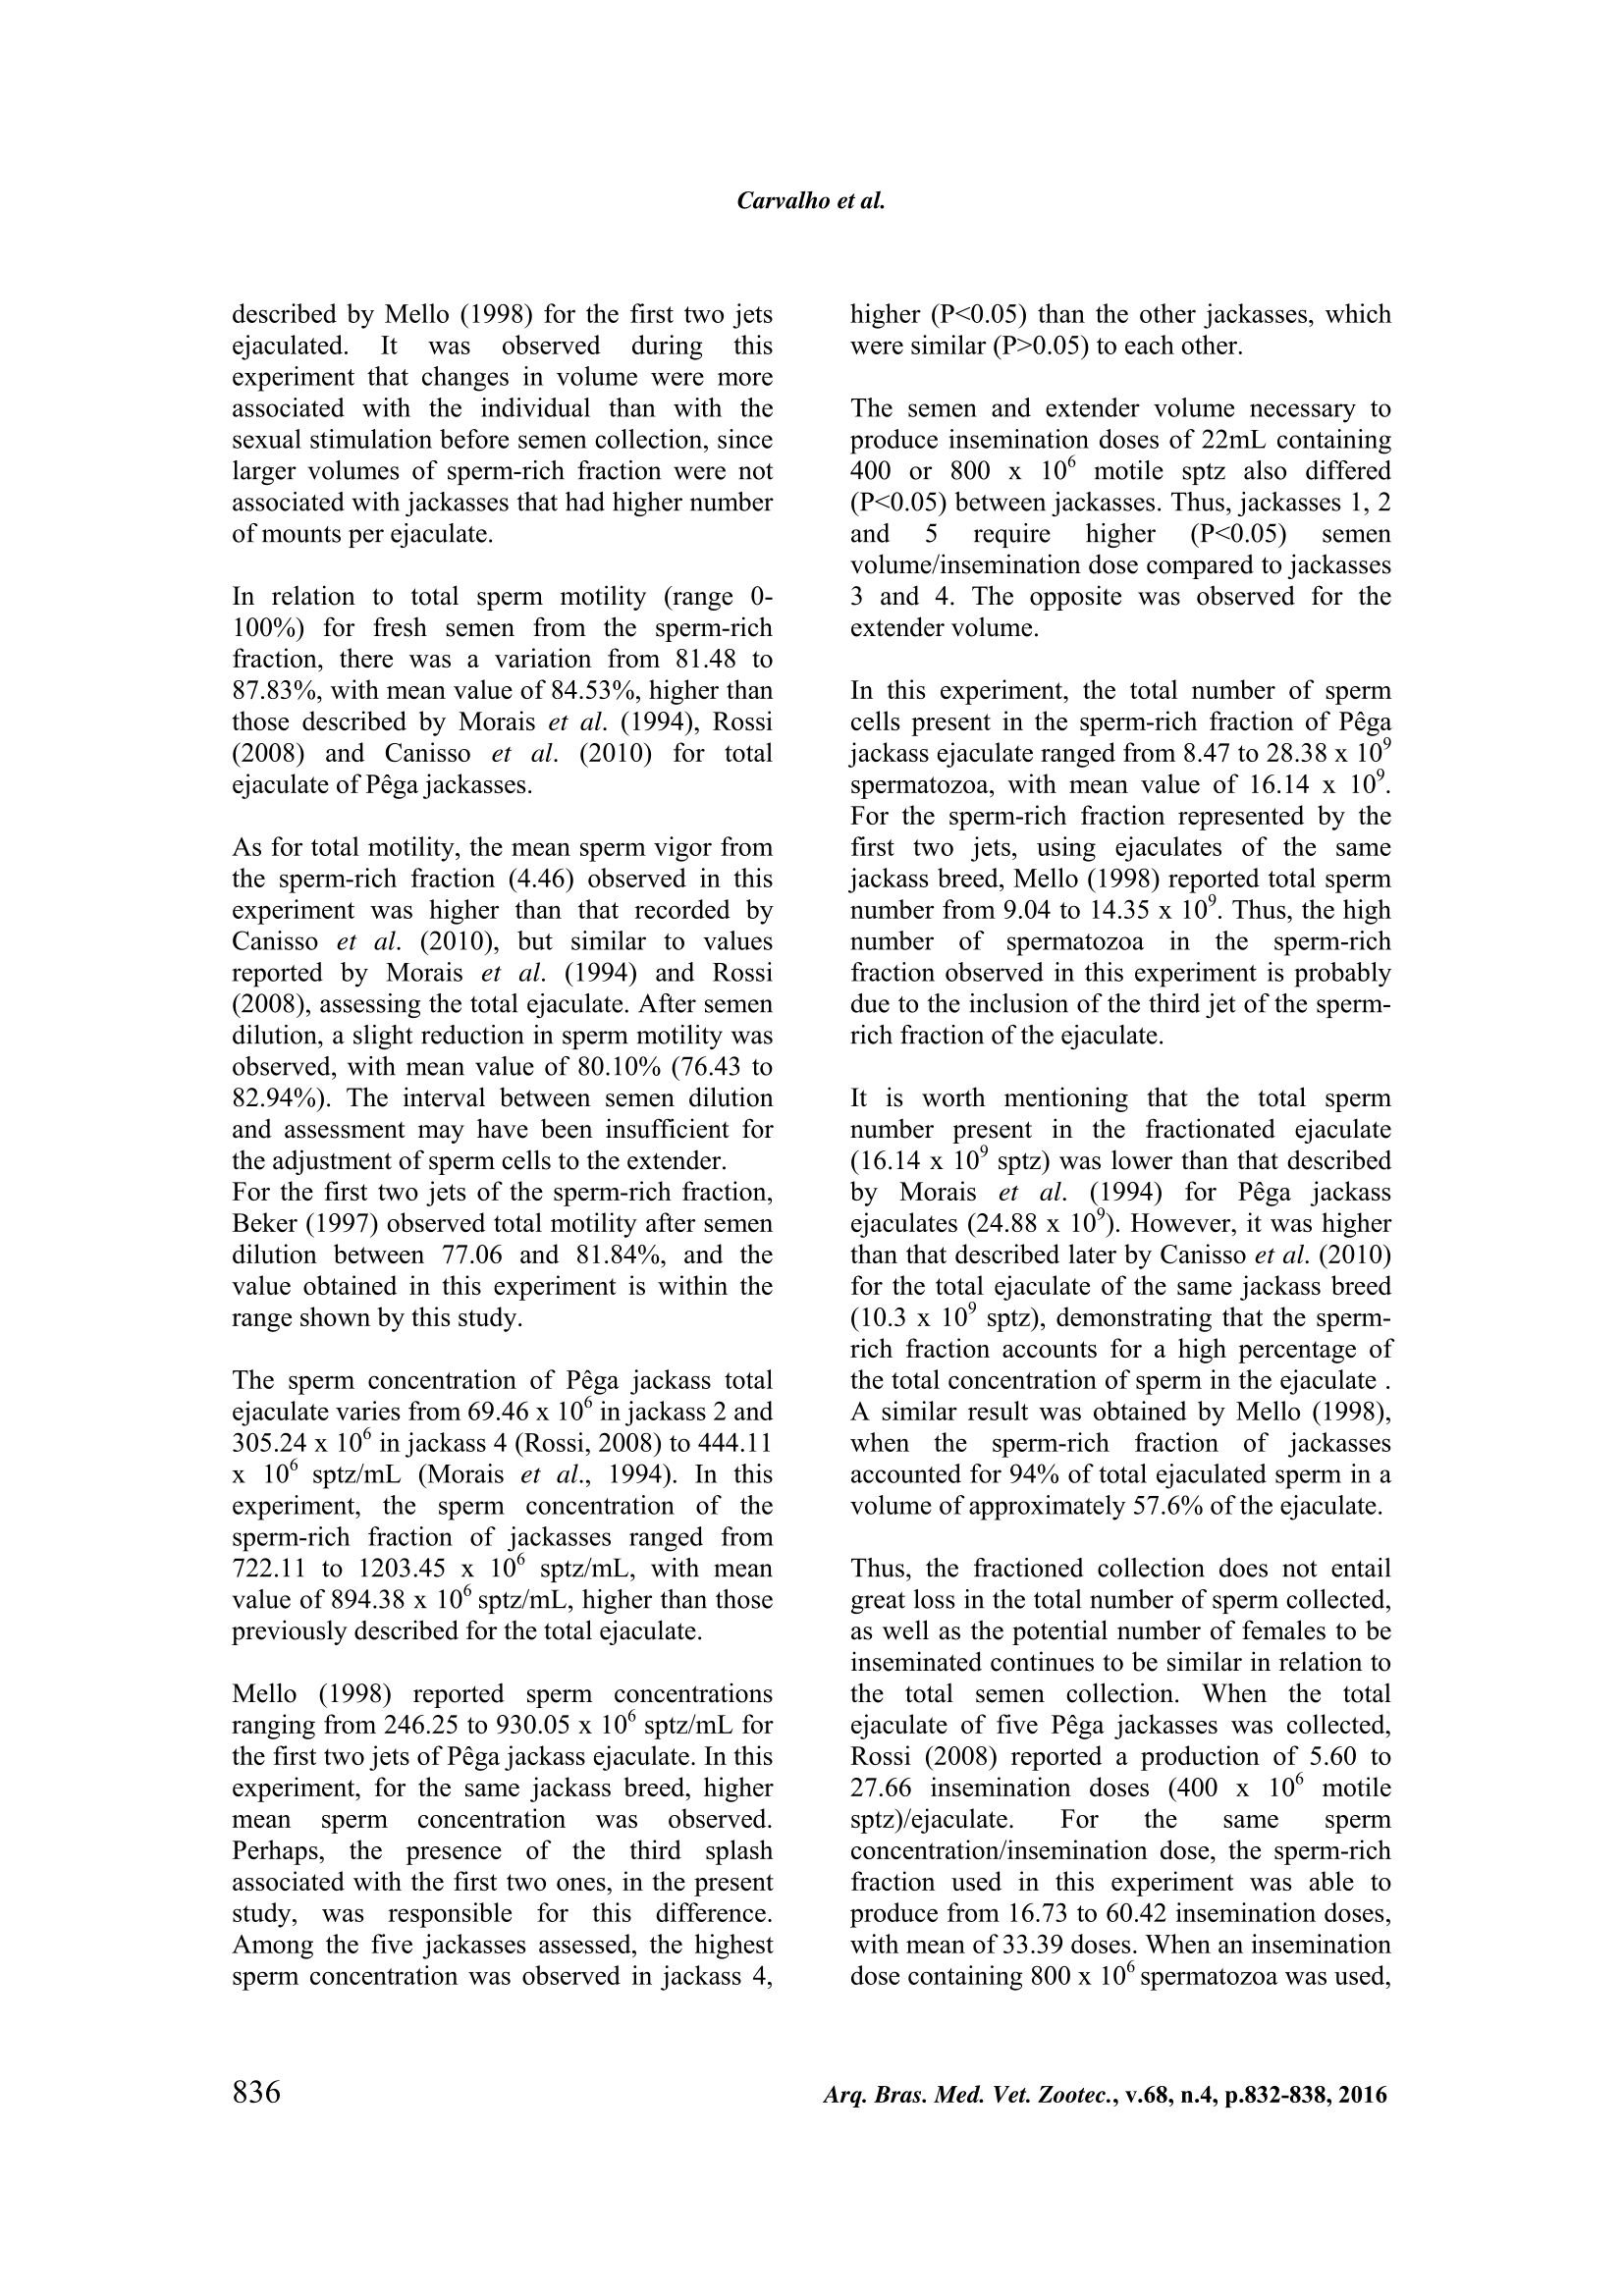 AMA 1-5 (1).png